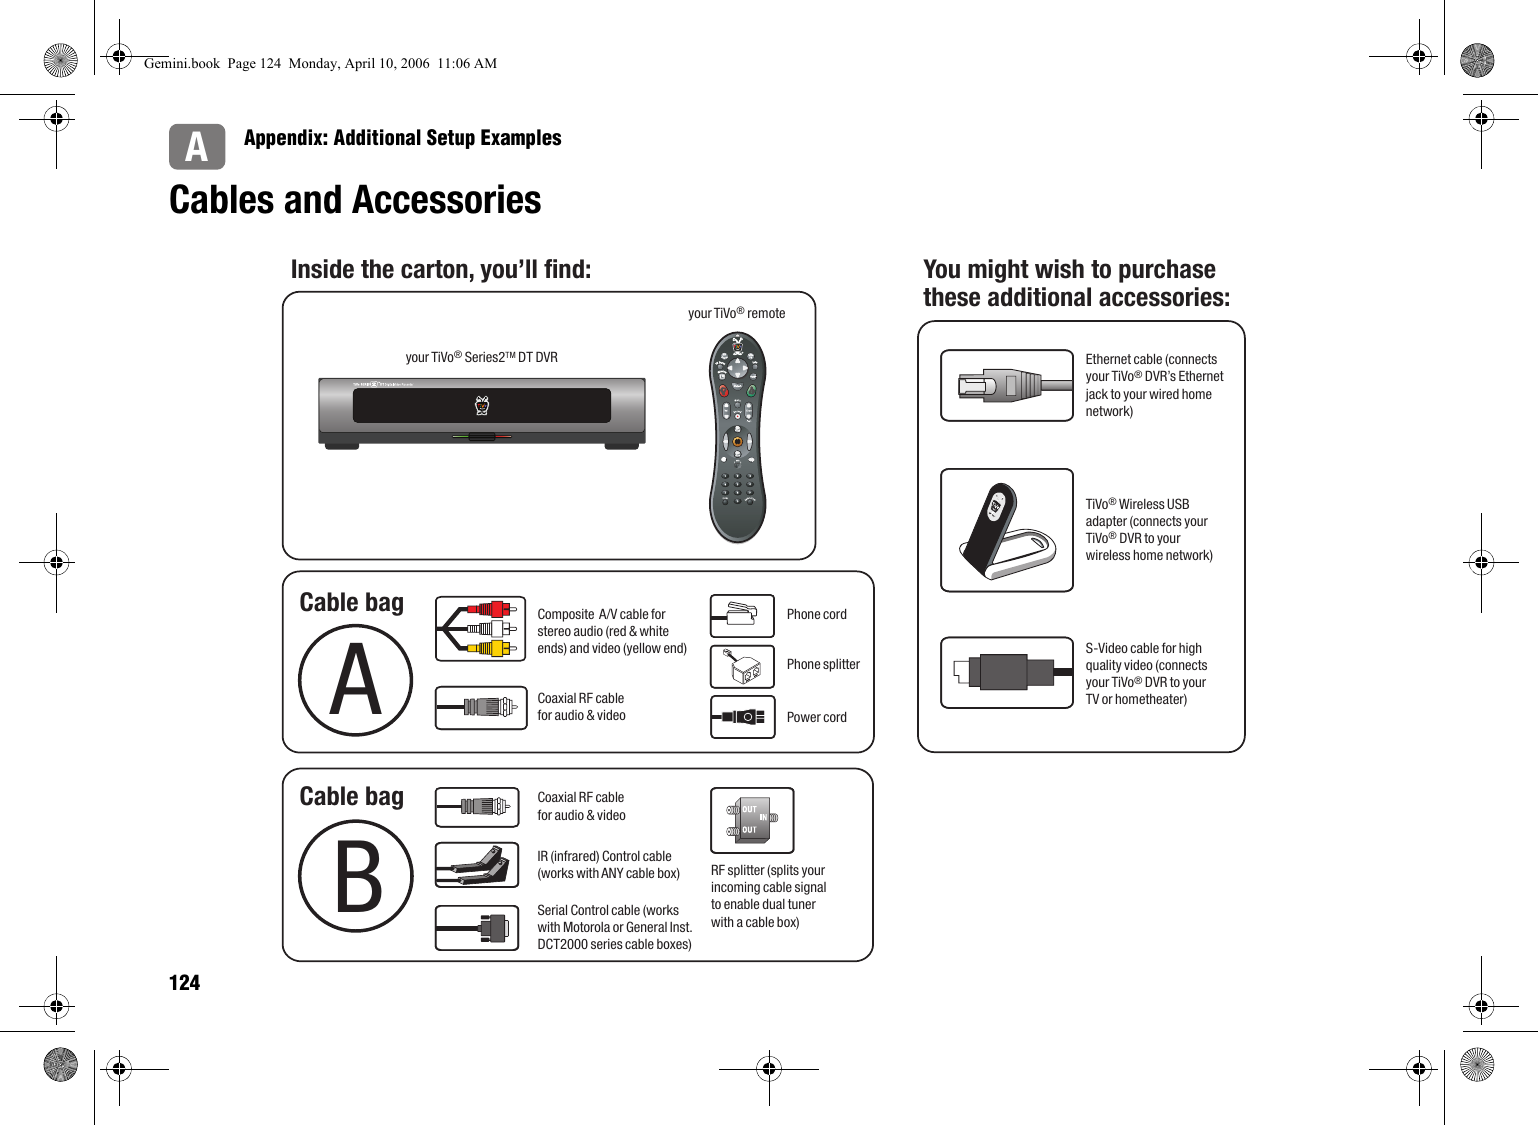 tivo series 2 manual user manual guide u2022 rh fashionfilter co